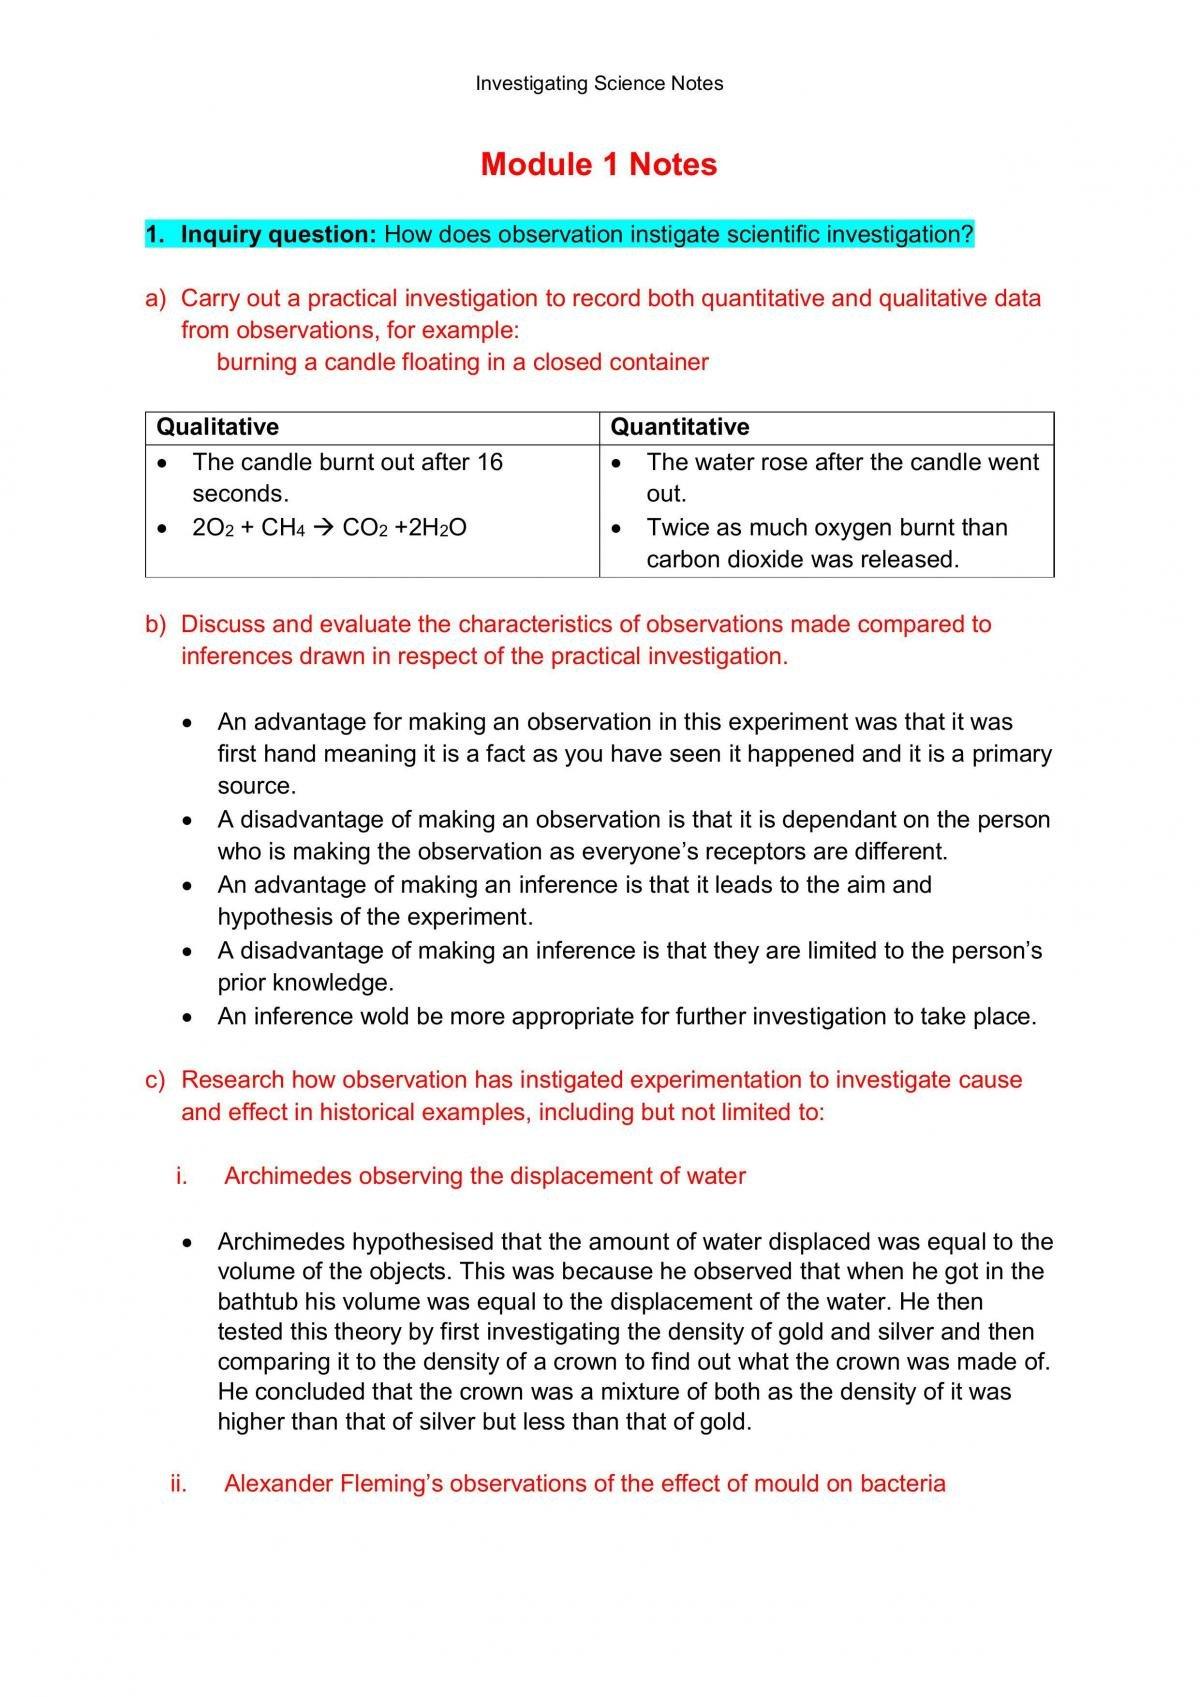 Investigating Science Prelim Notes - Page 1